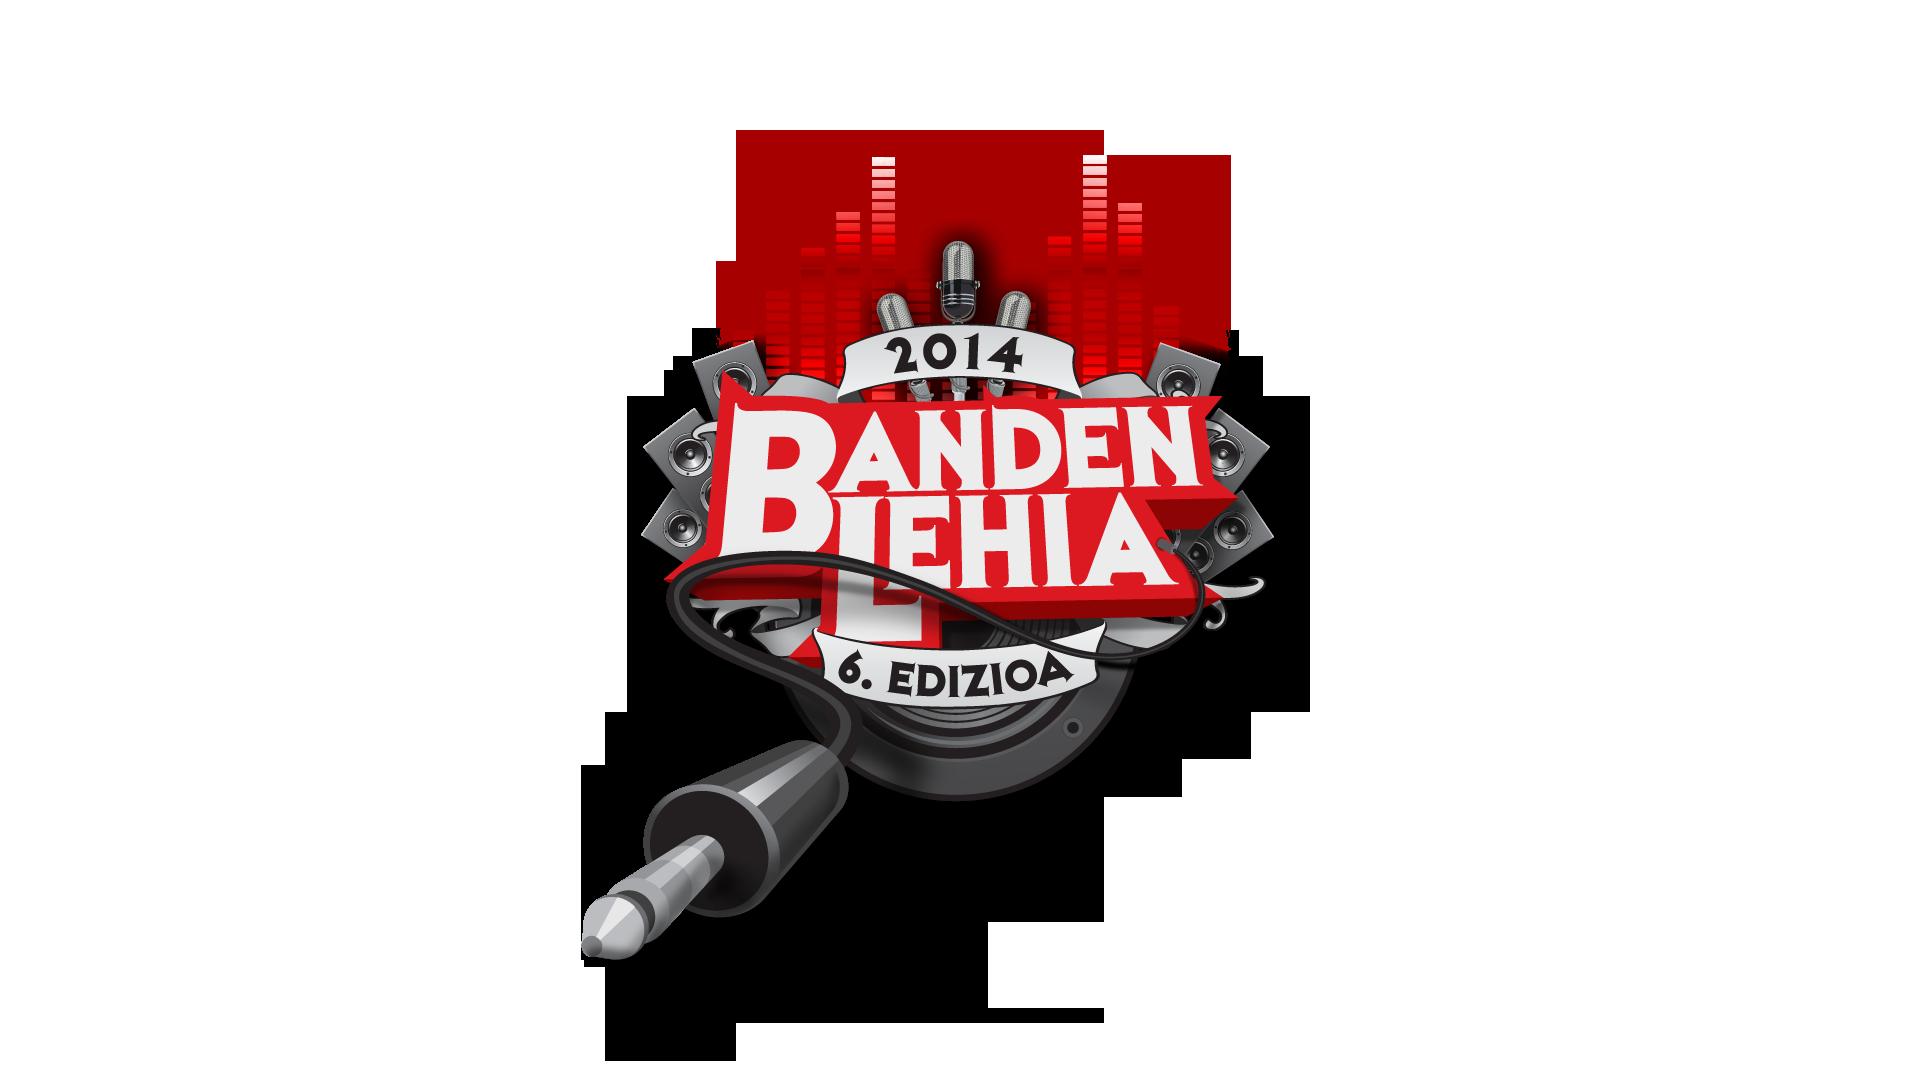 BandenLehia2014